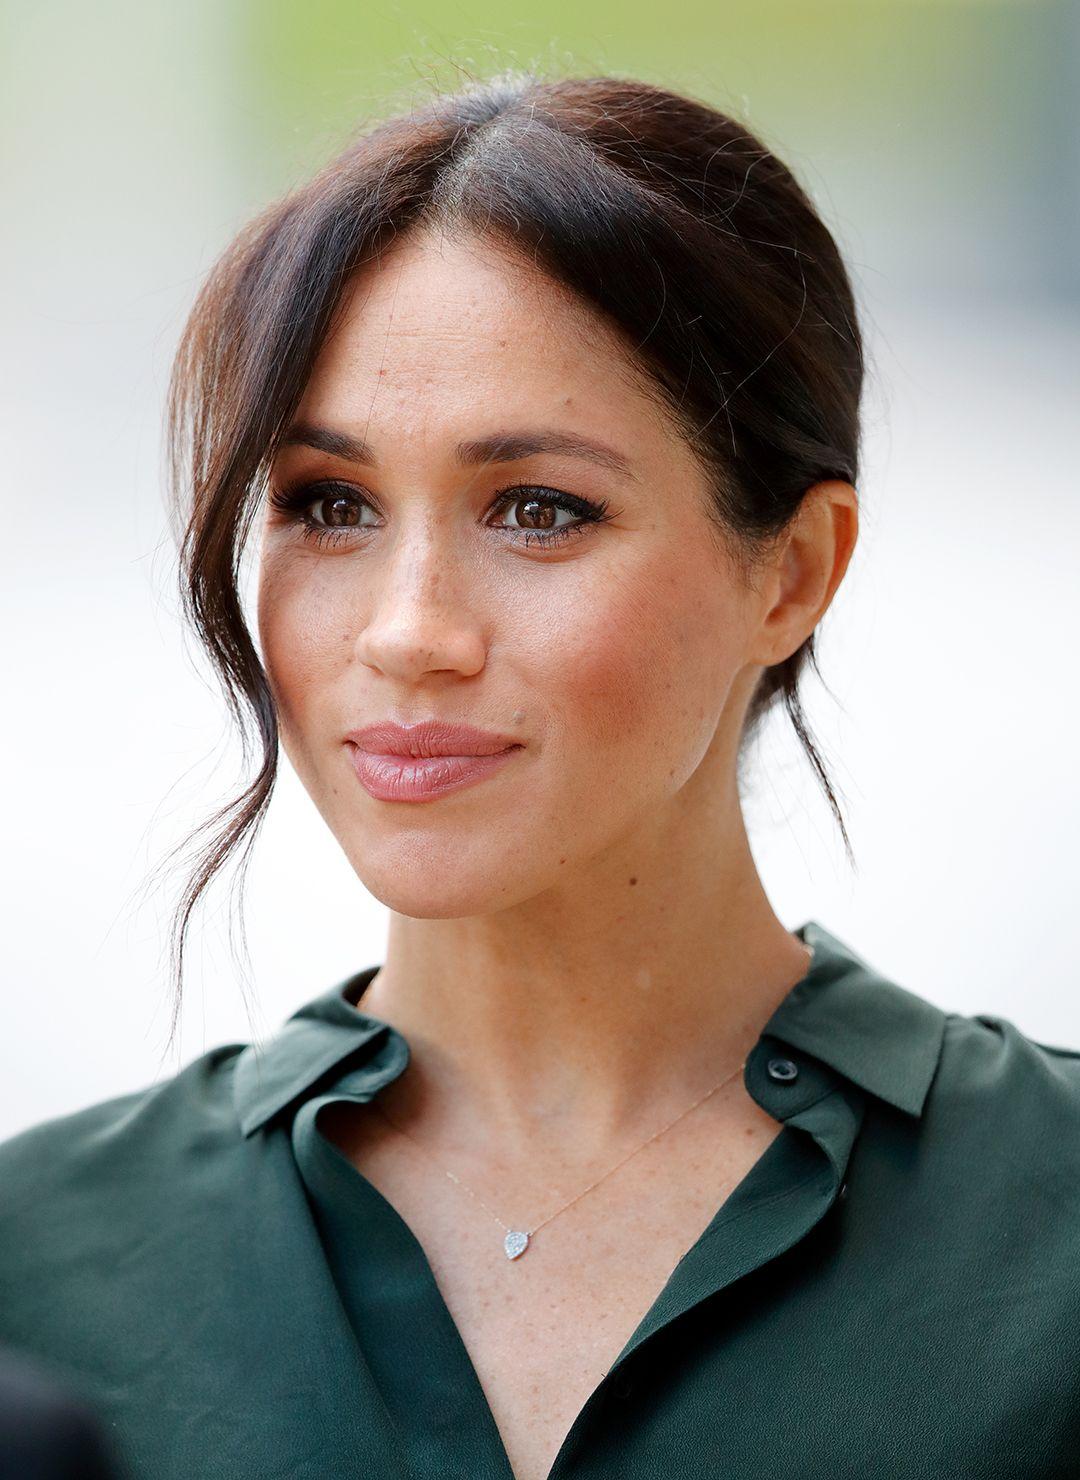 Duchess Of Sussex hair